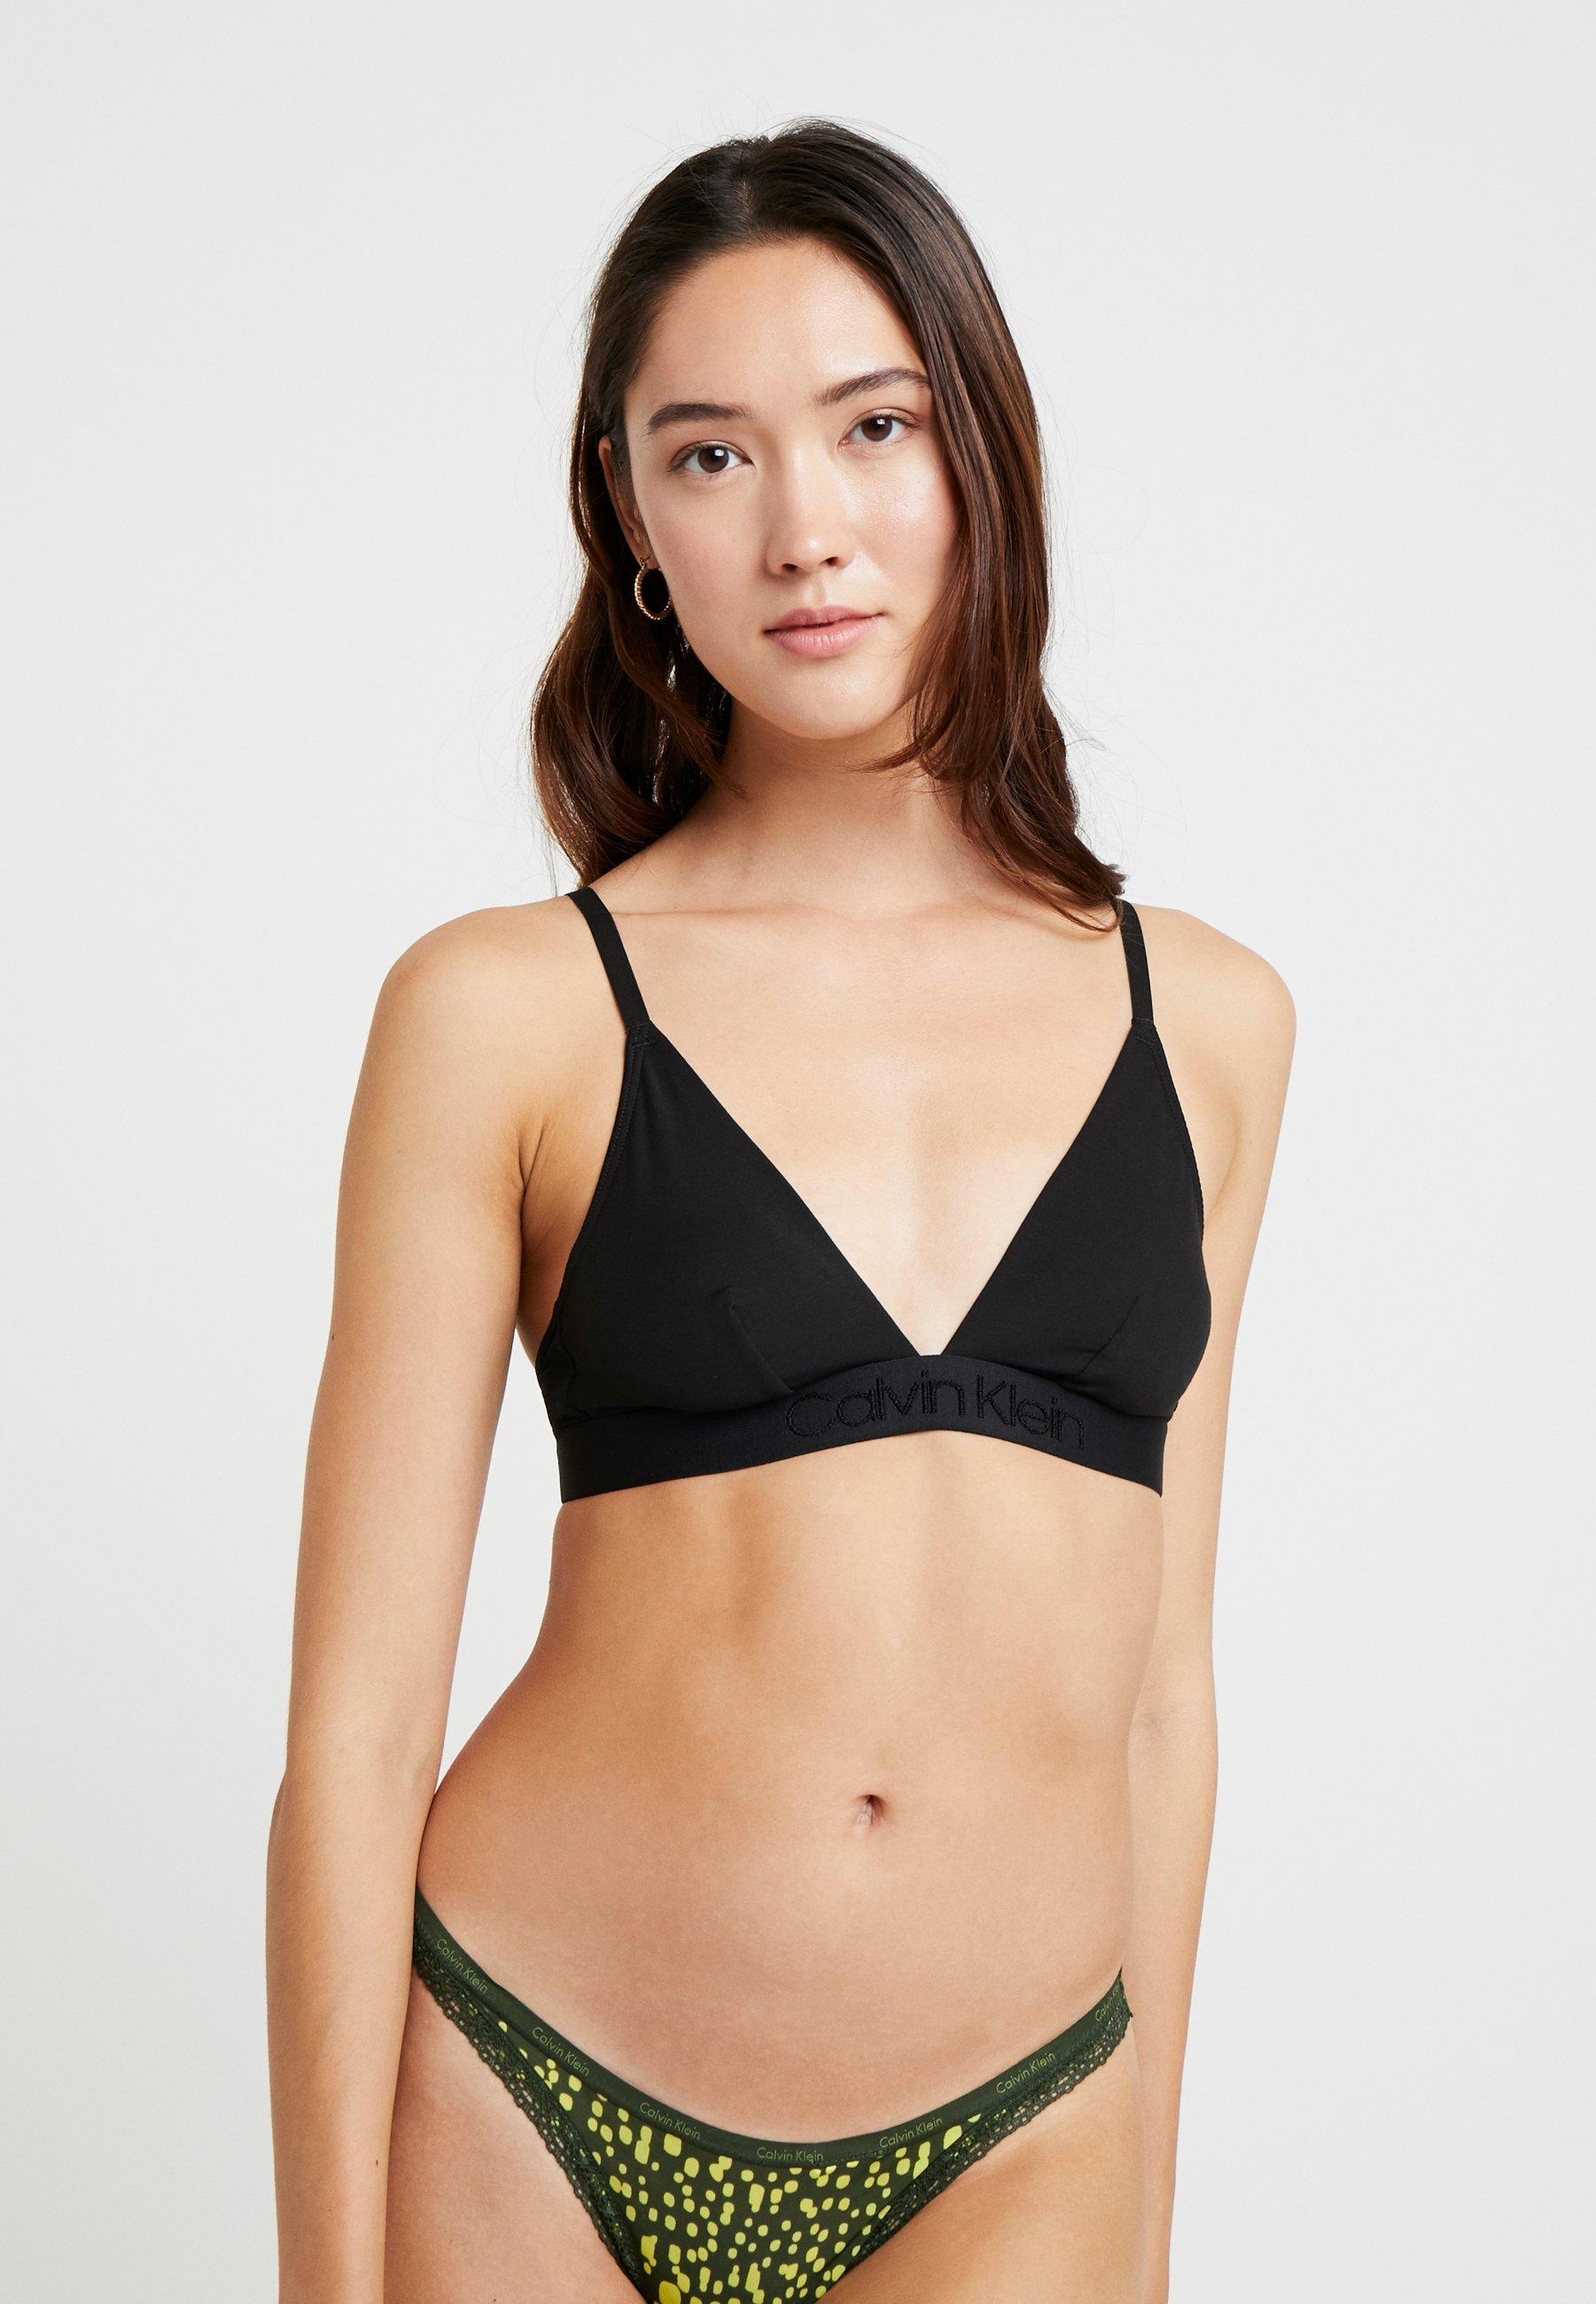 Femme UNLINED - Soutien-gorge triangle